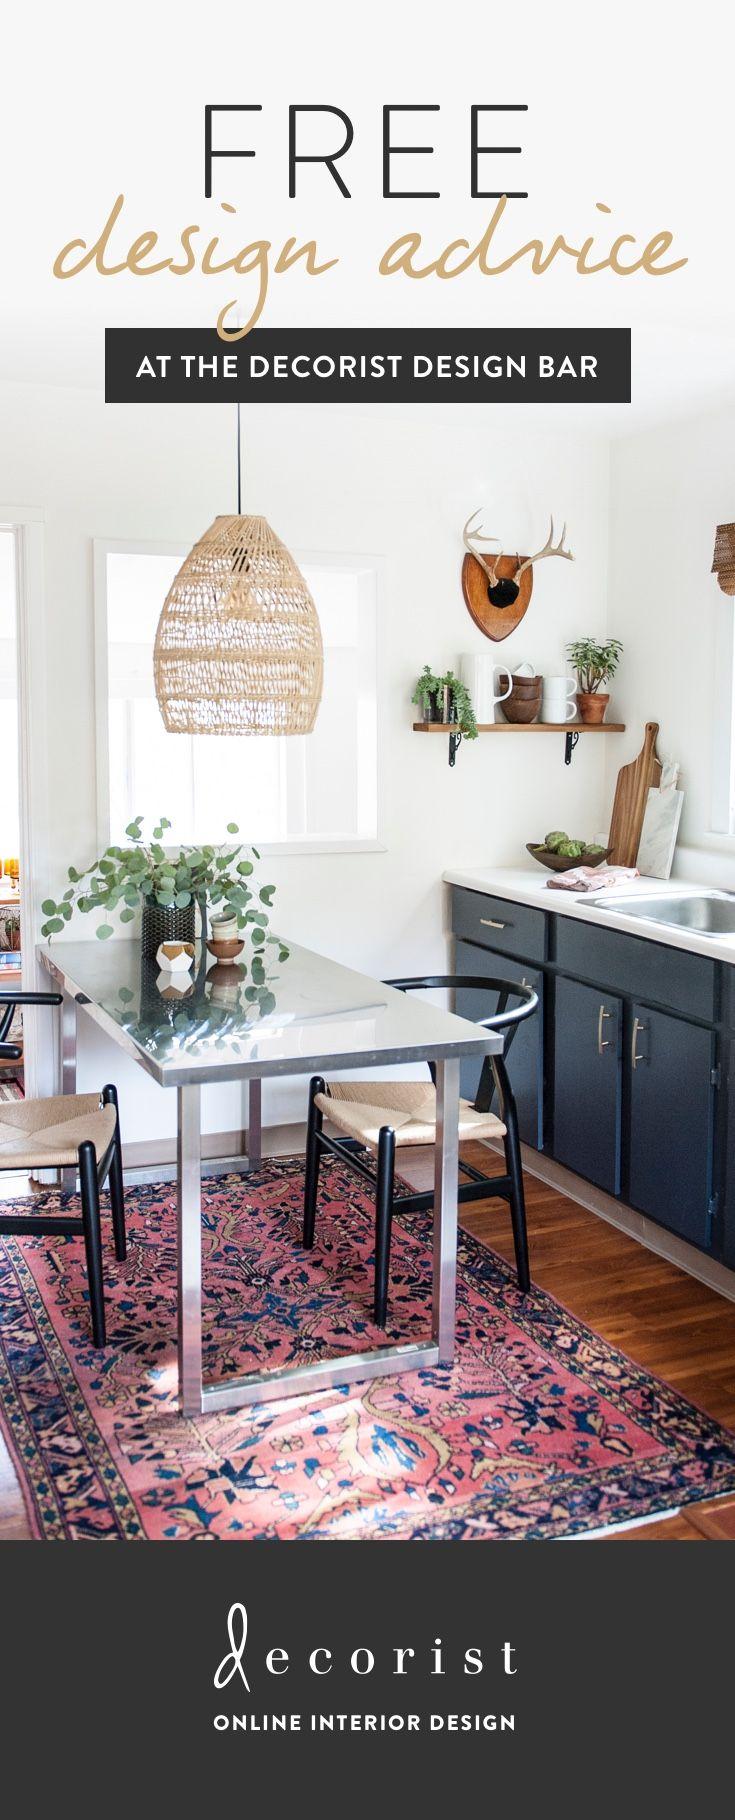 Home Plans Interiors Design » ask an interior designer online free ...